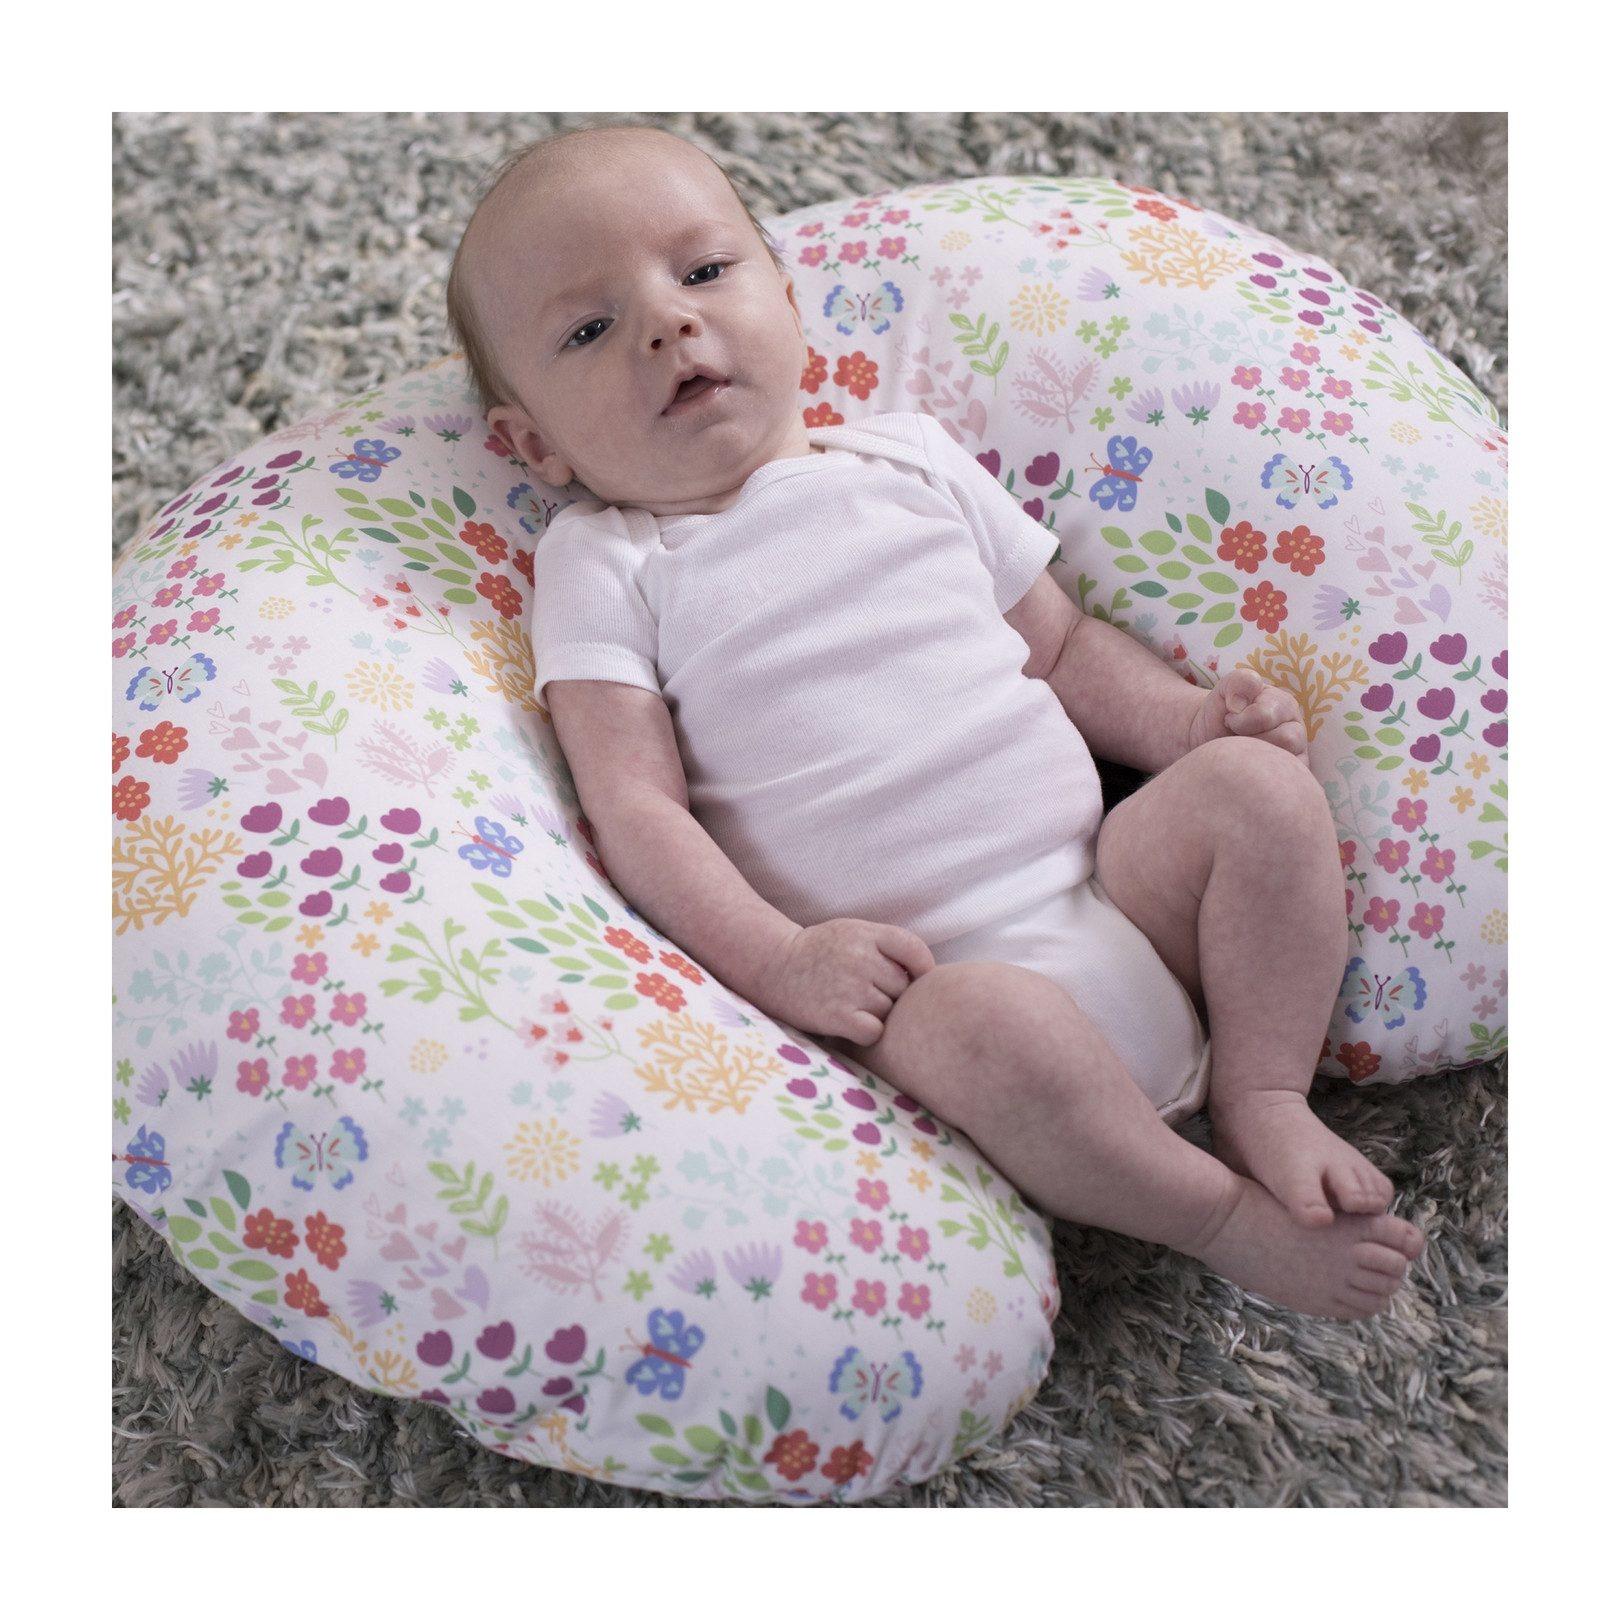 Boppy Boppy Classic Pillow - Garden Party